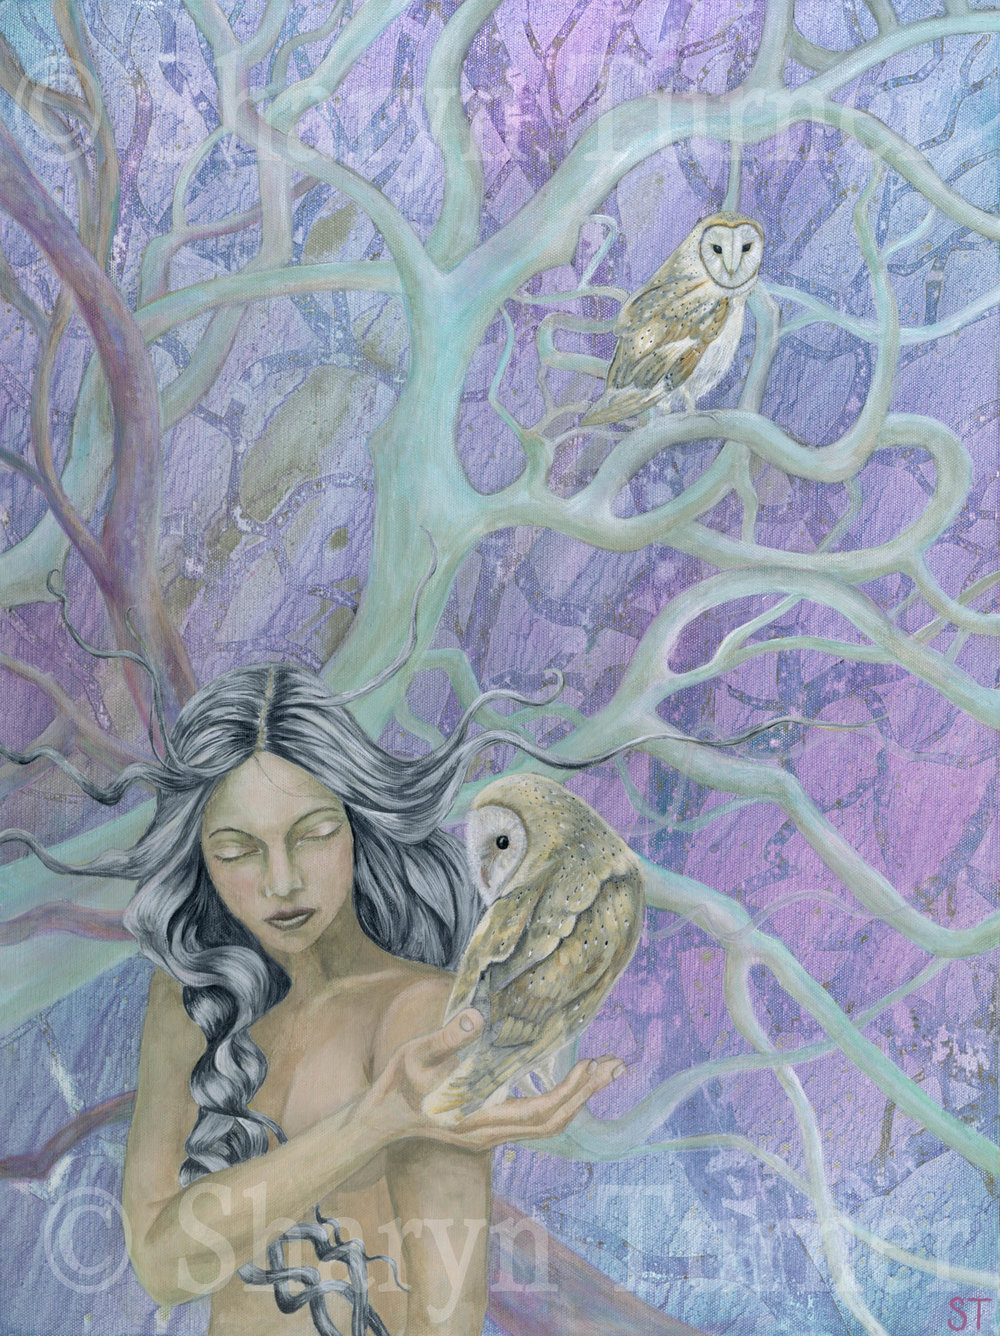 Twilight Messenger (Acrylic on canvas) © Sharyn Turner 2016